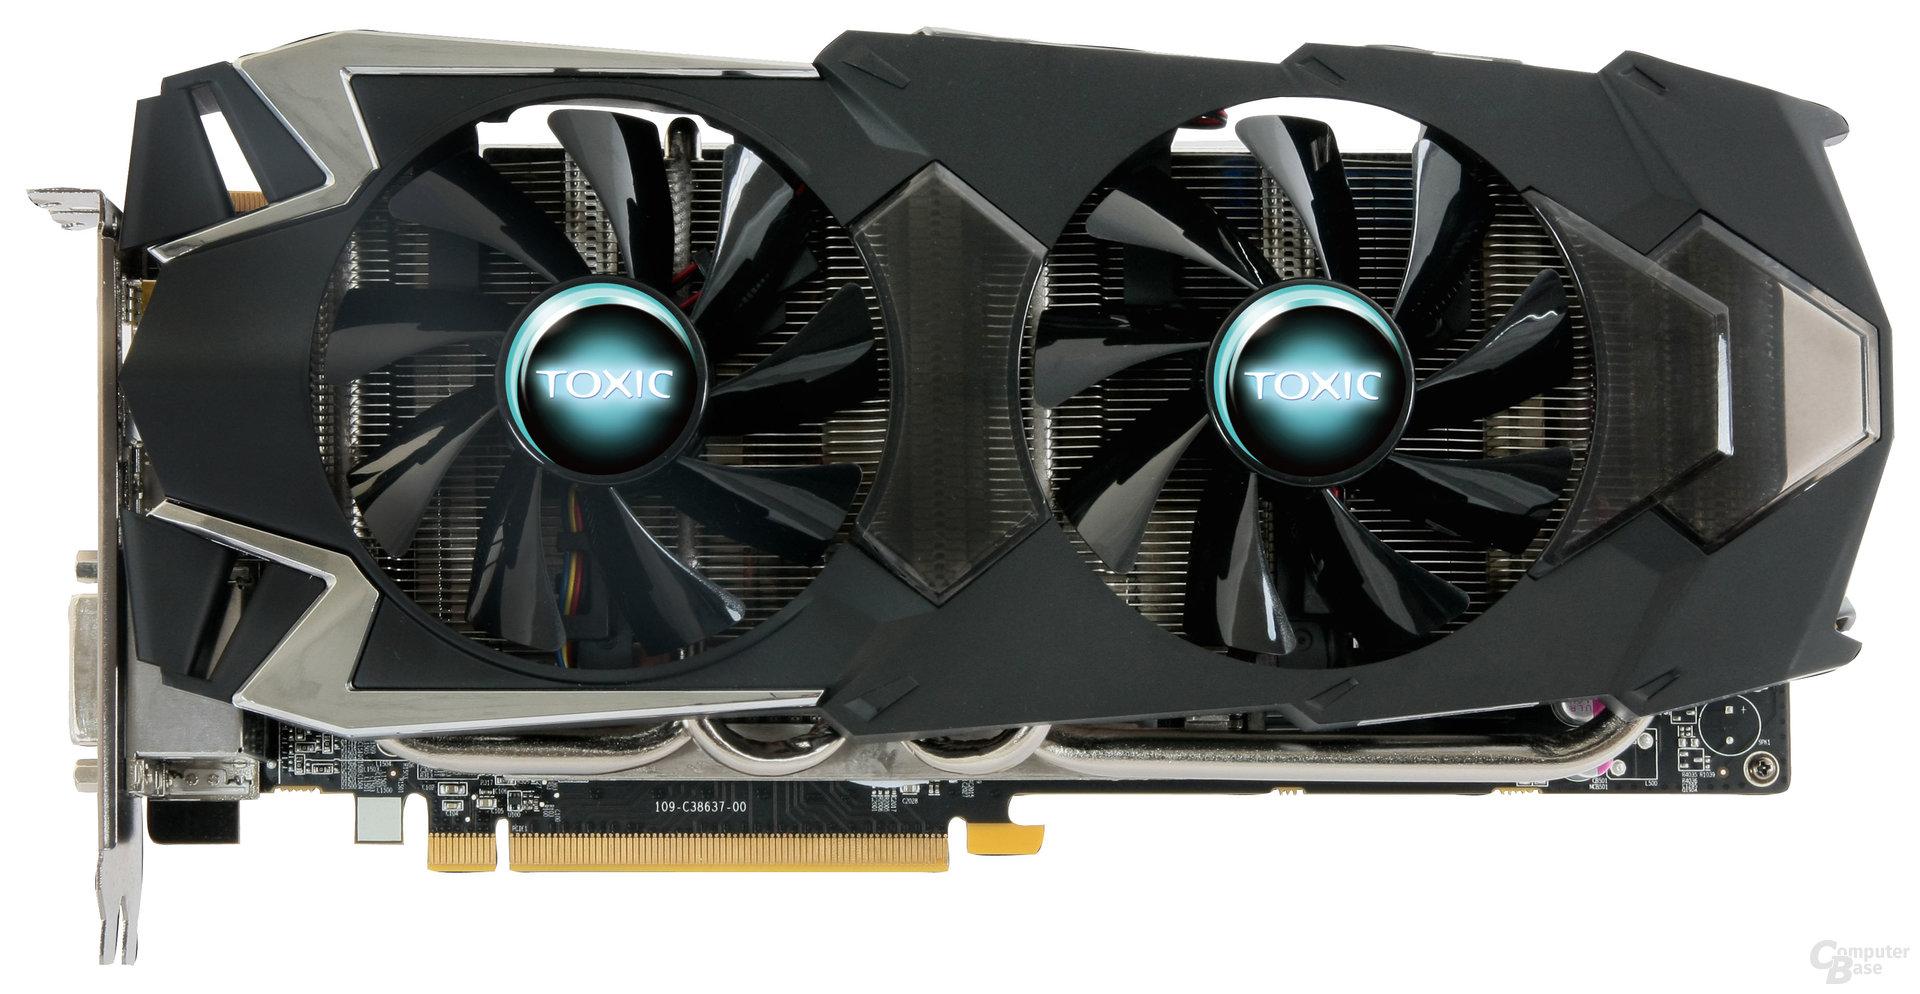 Sapphire Radeon HD 7970 Toxic 6 GB